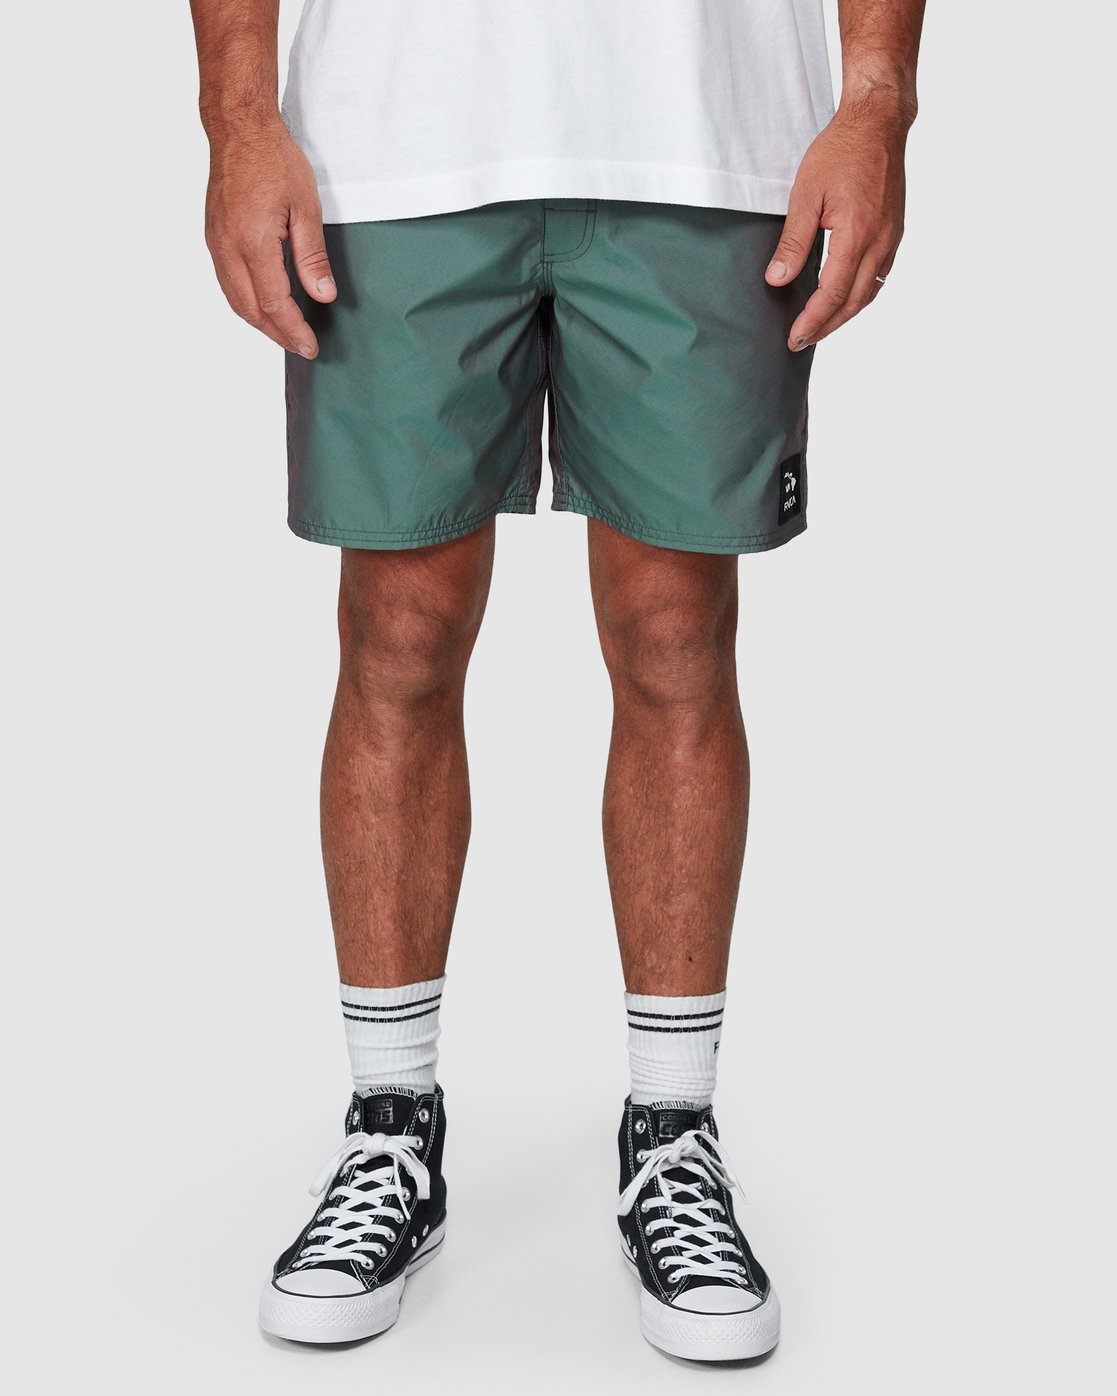 6 Hazed Elastic Shorts  R307400 RVCA